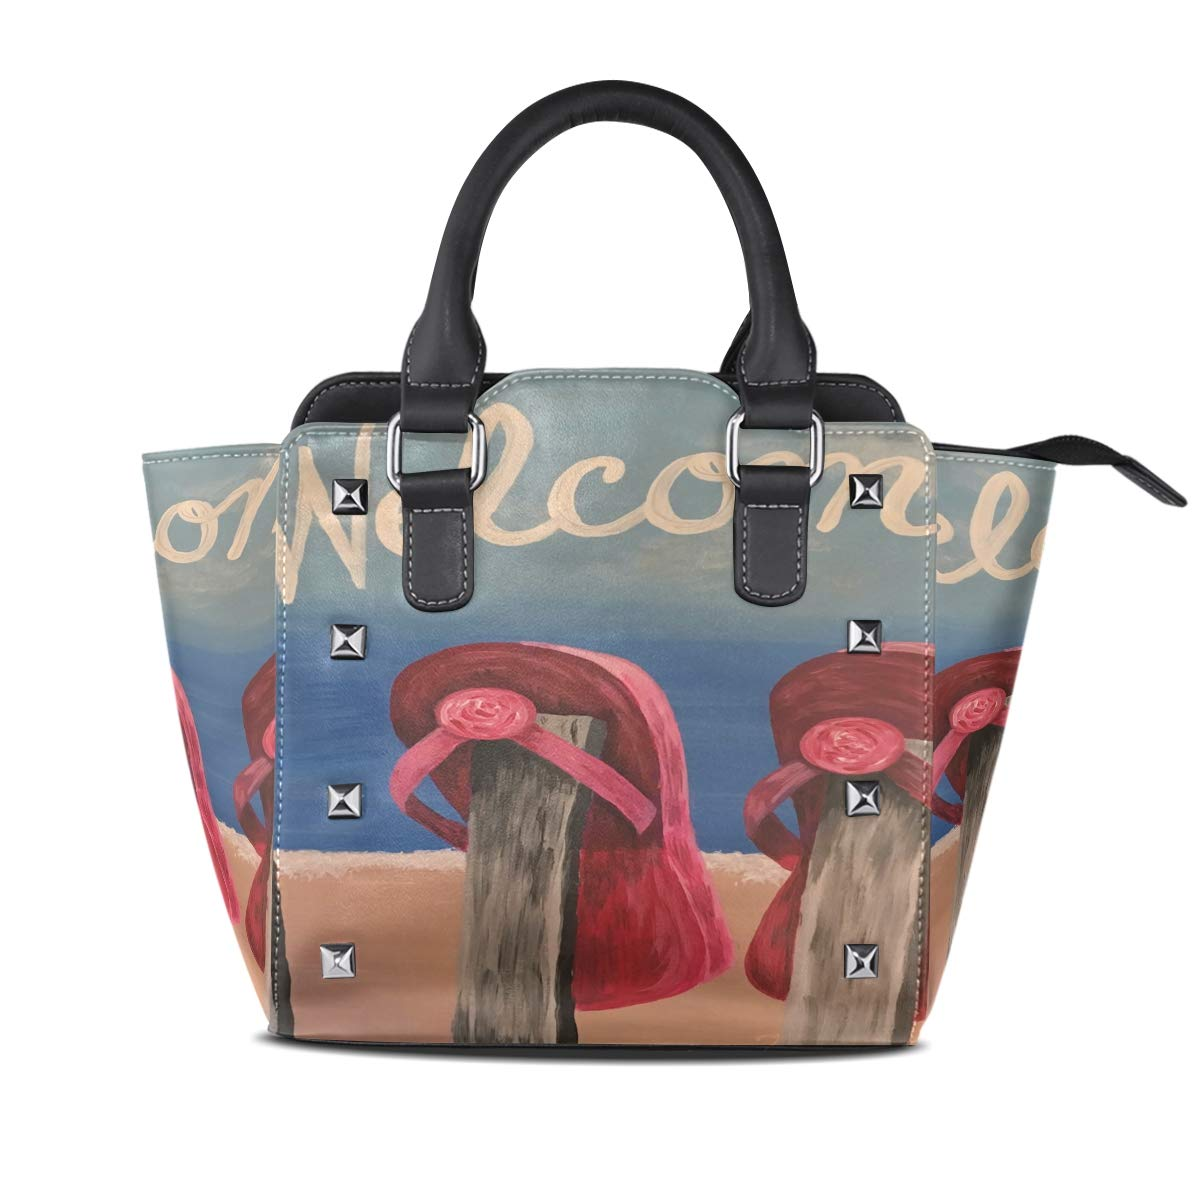 Design 2 Handbag Dolphins Out Of The Sea Sunset Genuine Leather Tote Rivet Bag Shoulder Strap Top Handle Women